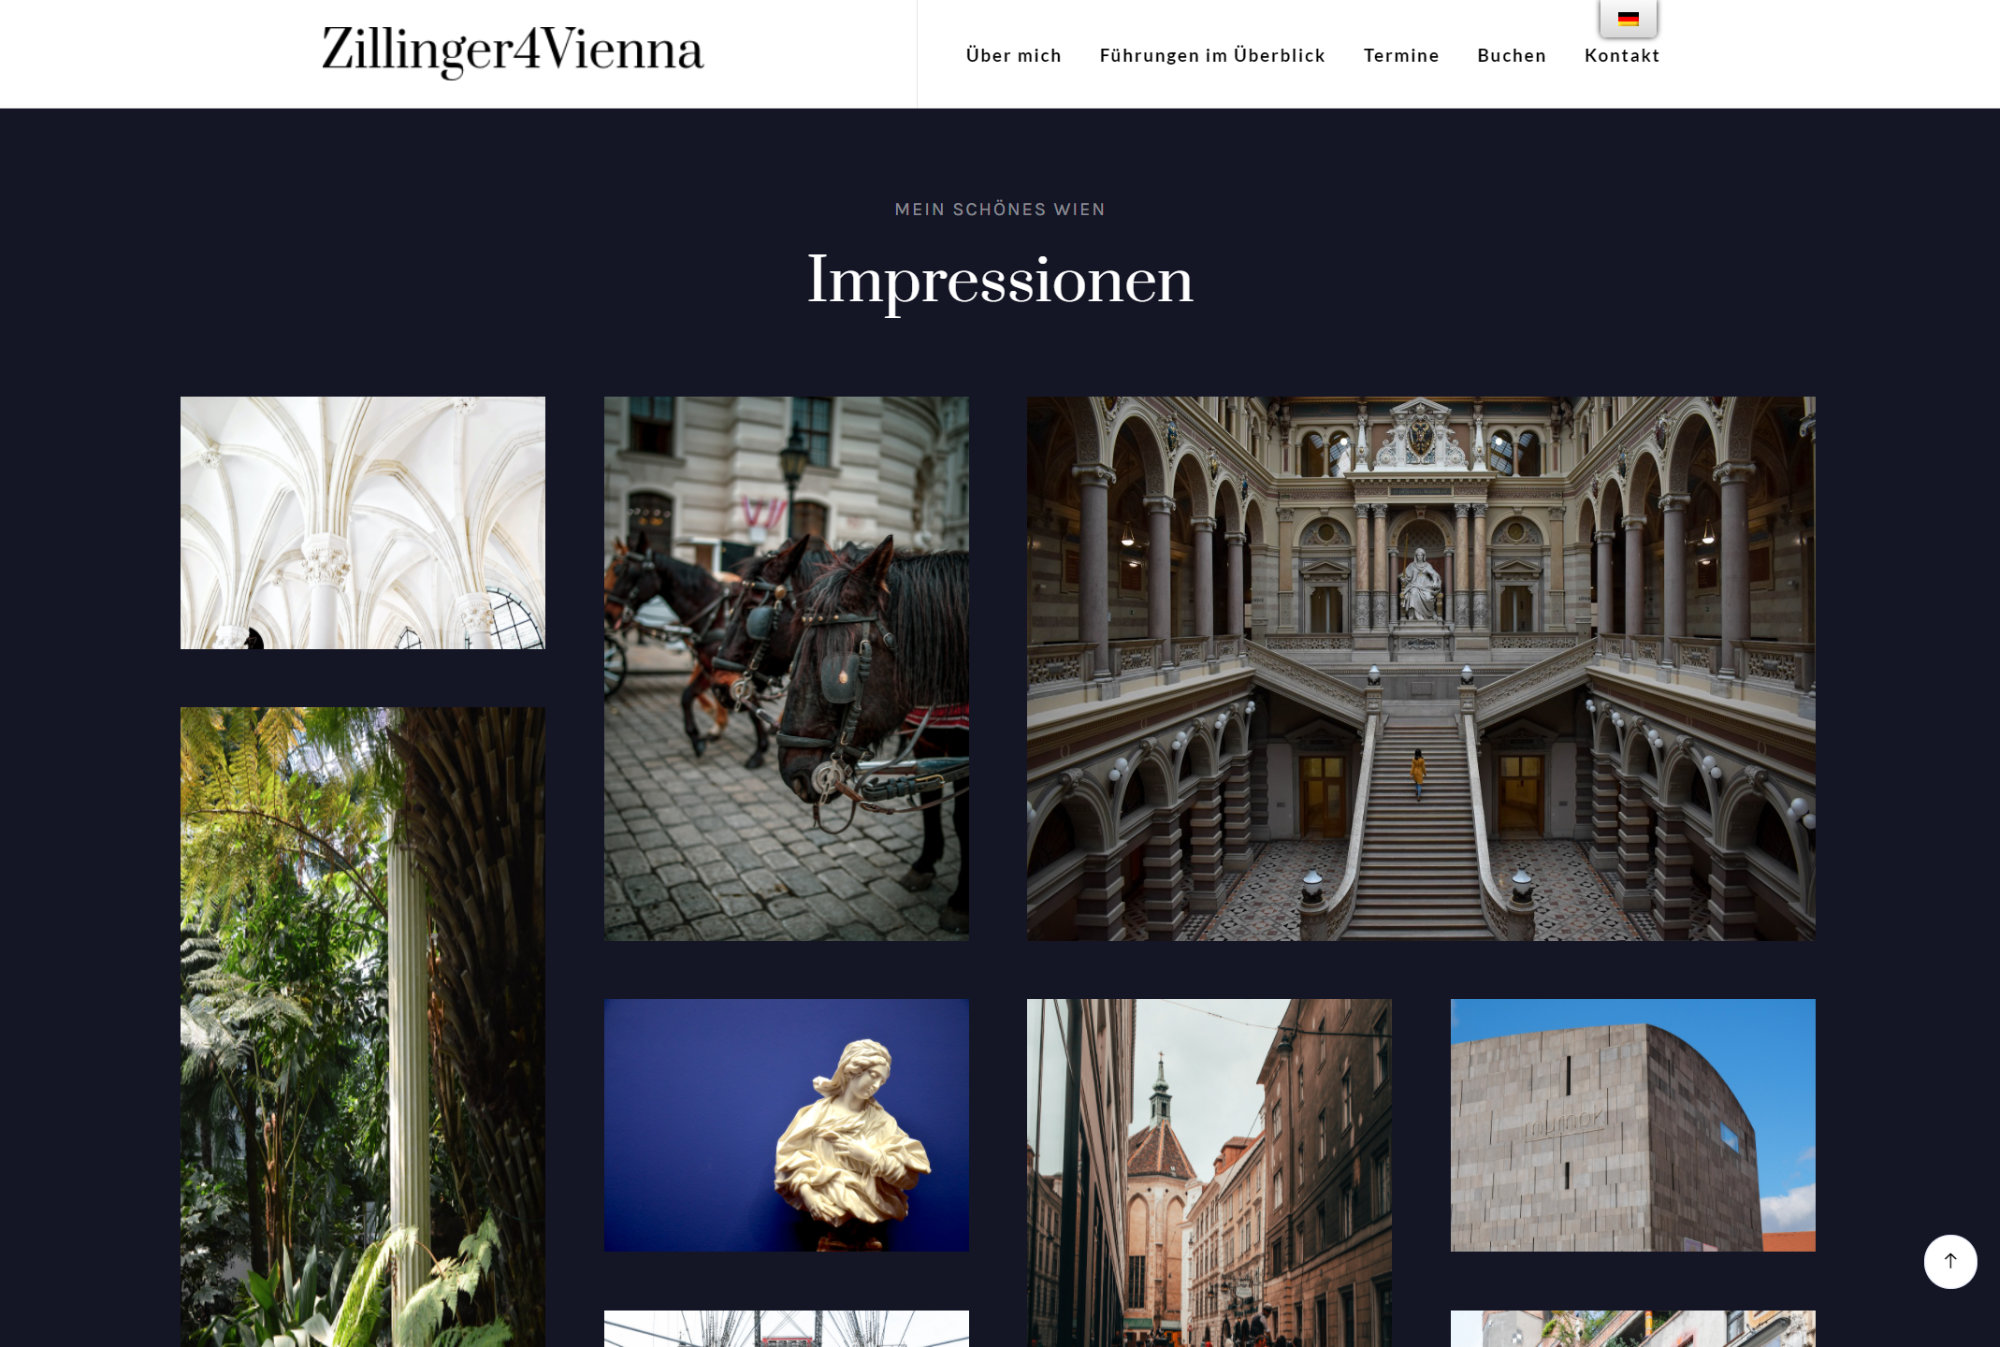 whateverworks-Zillinger4Vienna-E